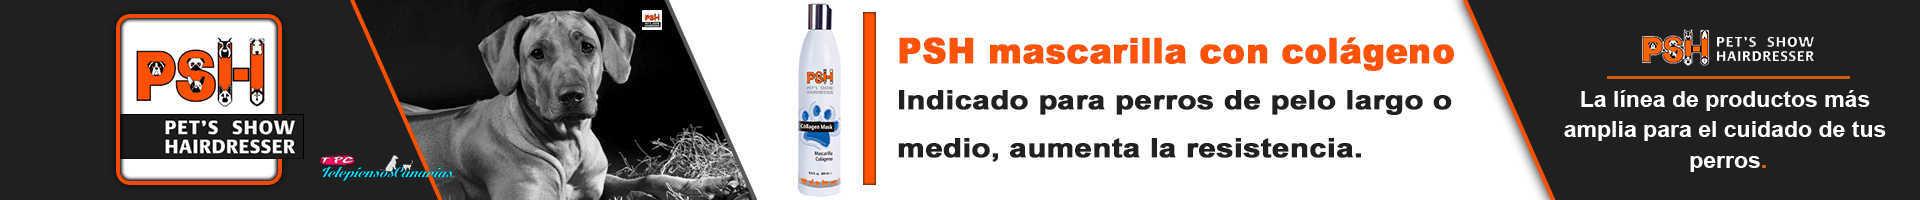 PSH mascarilla para perros con colágeno, para razas de pelo largo